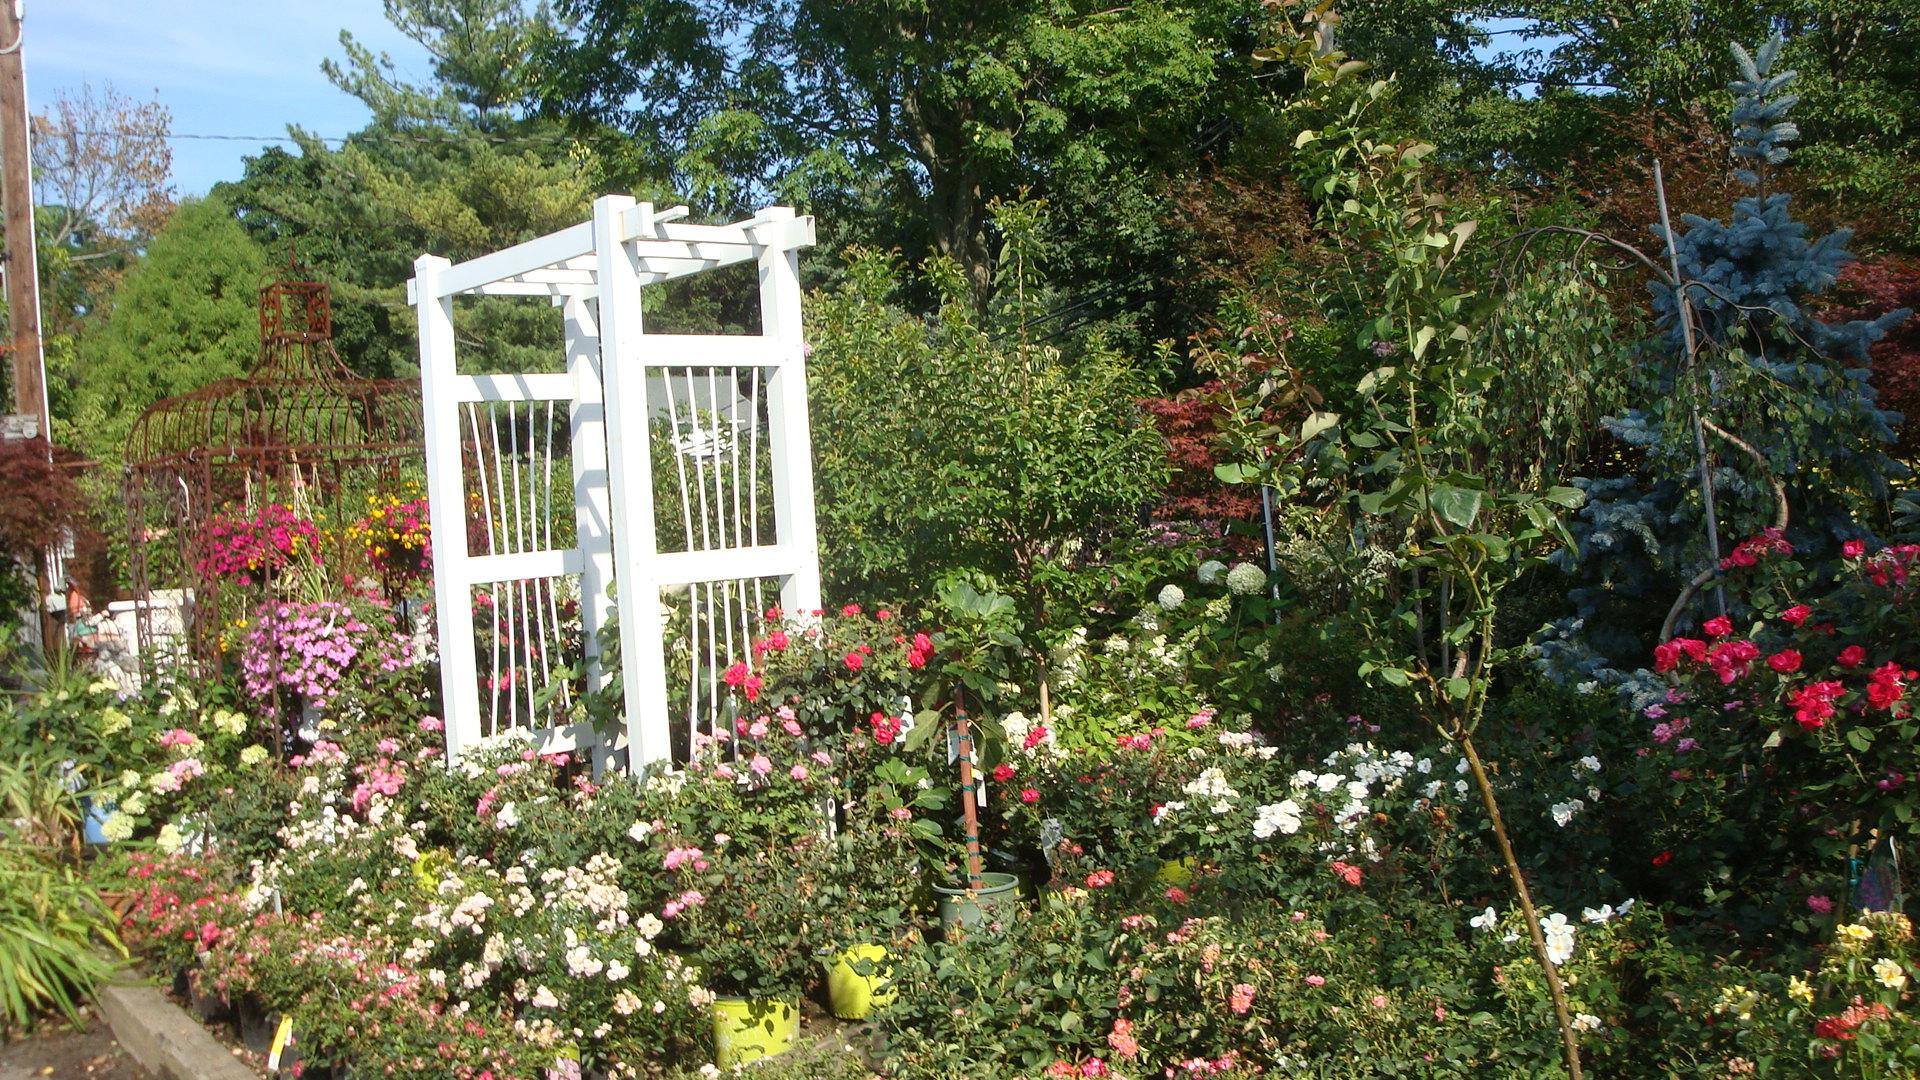 Tony Distefano Landscape Garden Center image 10